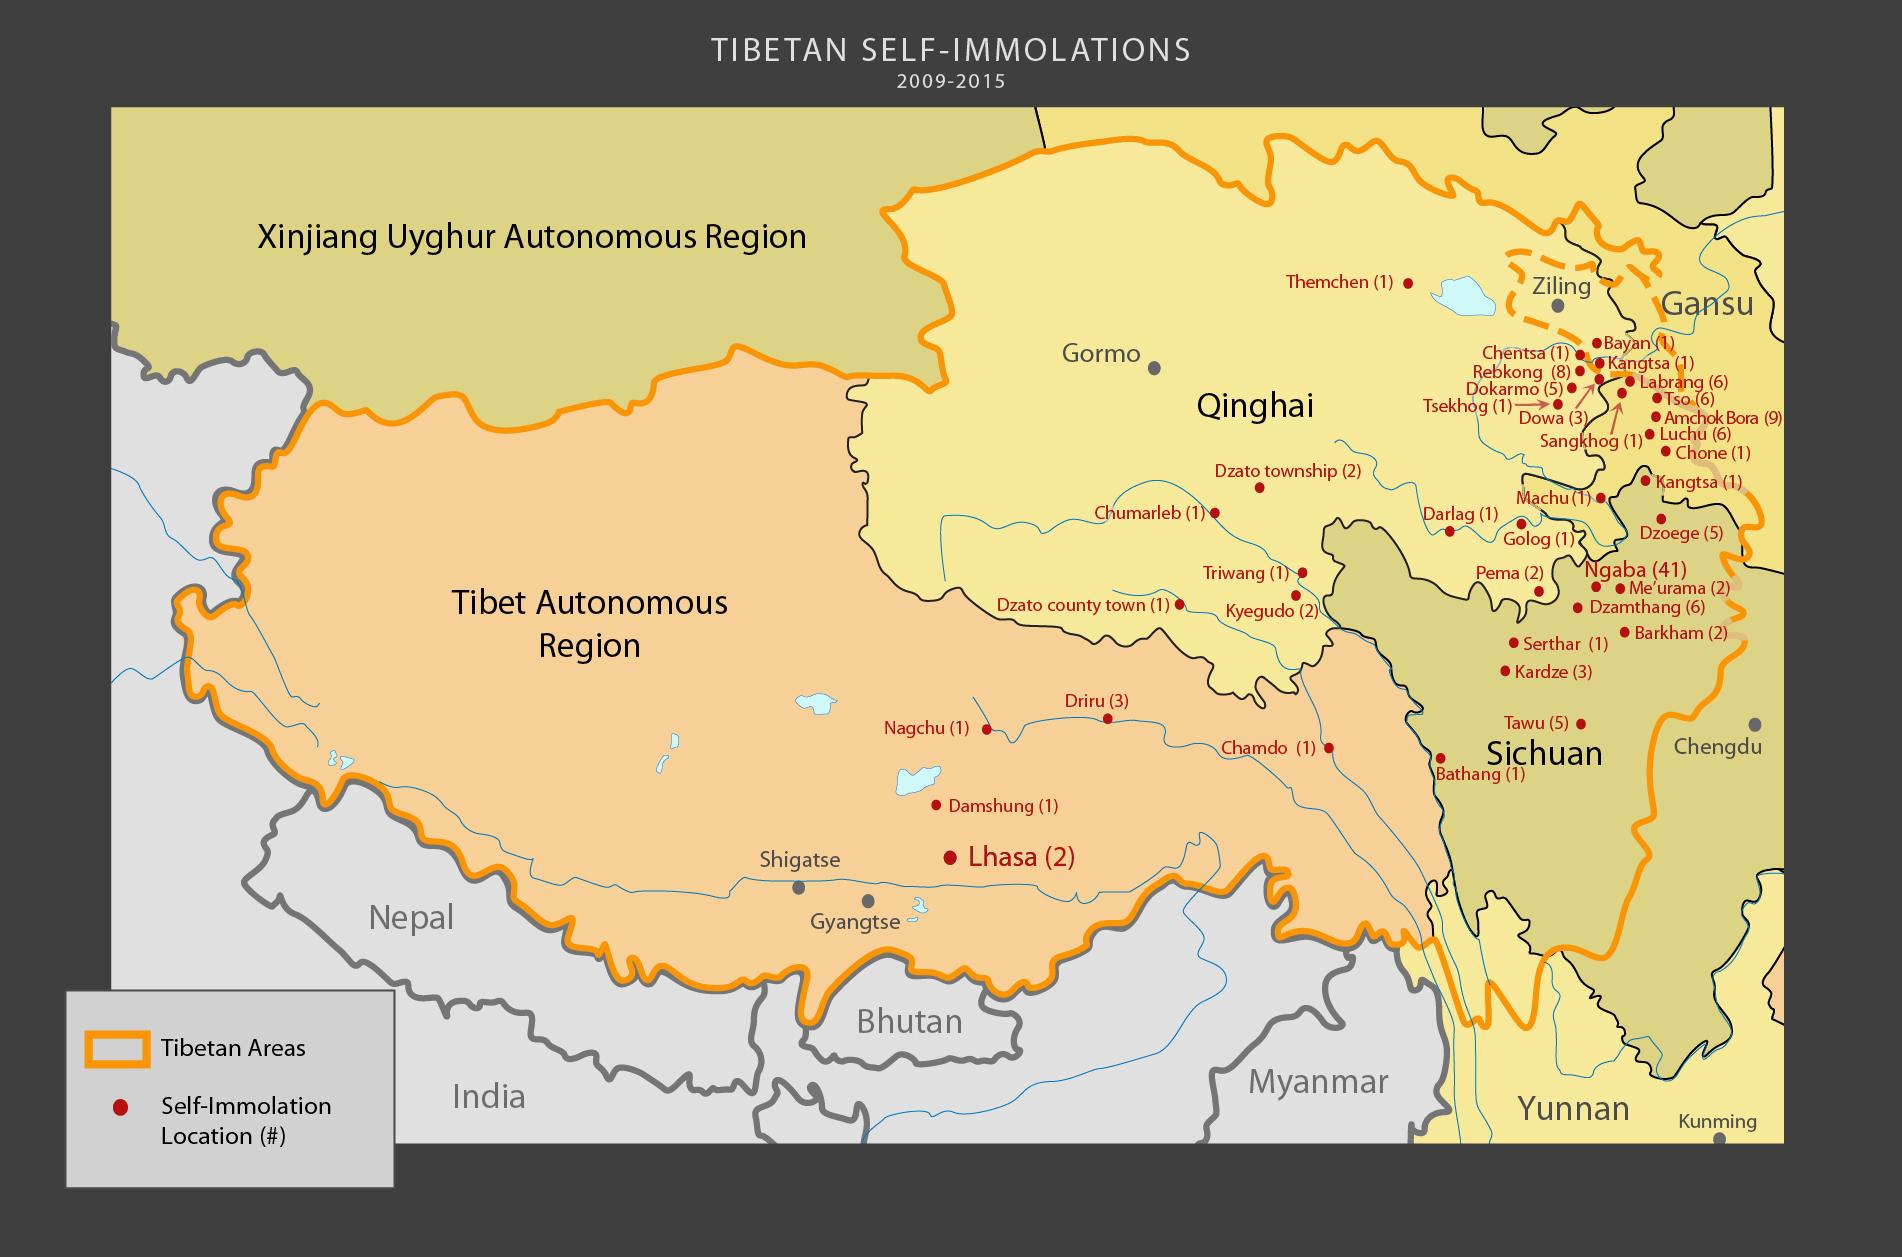 Tibet-map-immolations-0904-mid